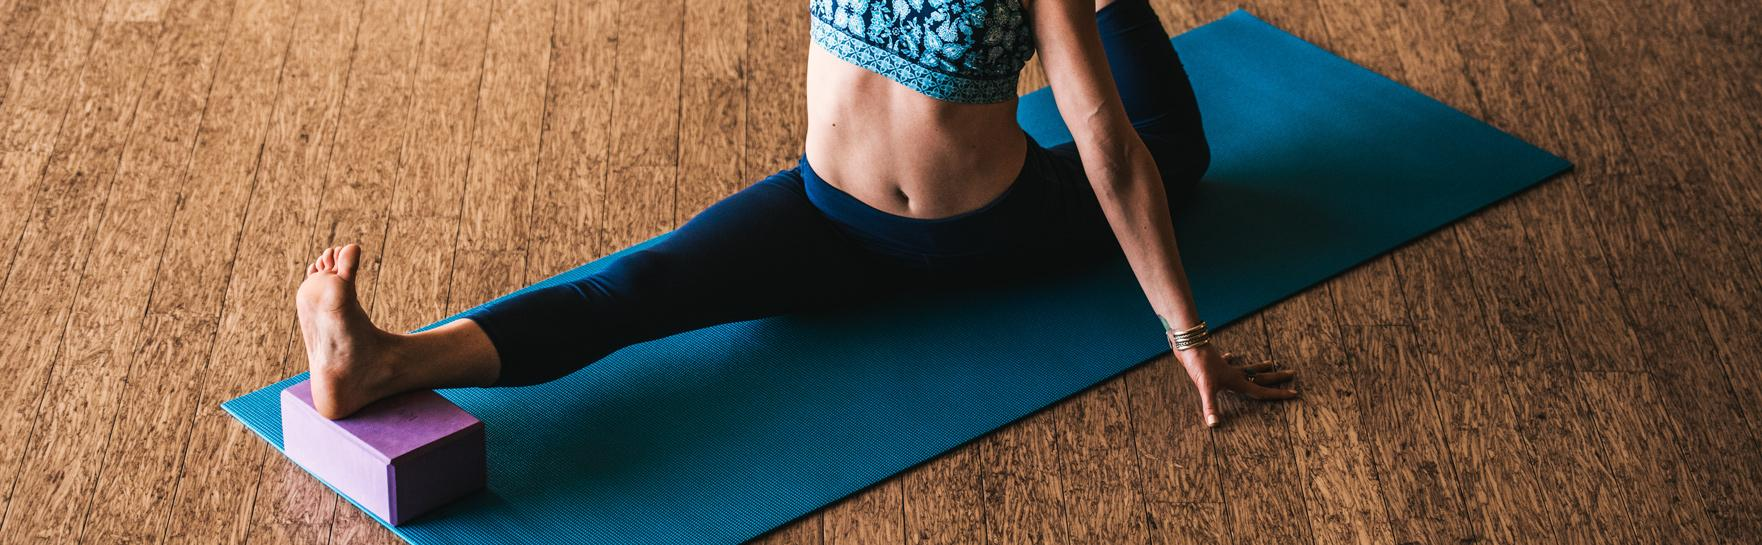 Amazon Com Gaiam Yoga Block Set Of 2 Supportive